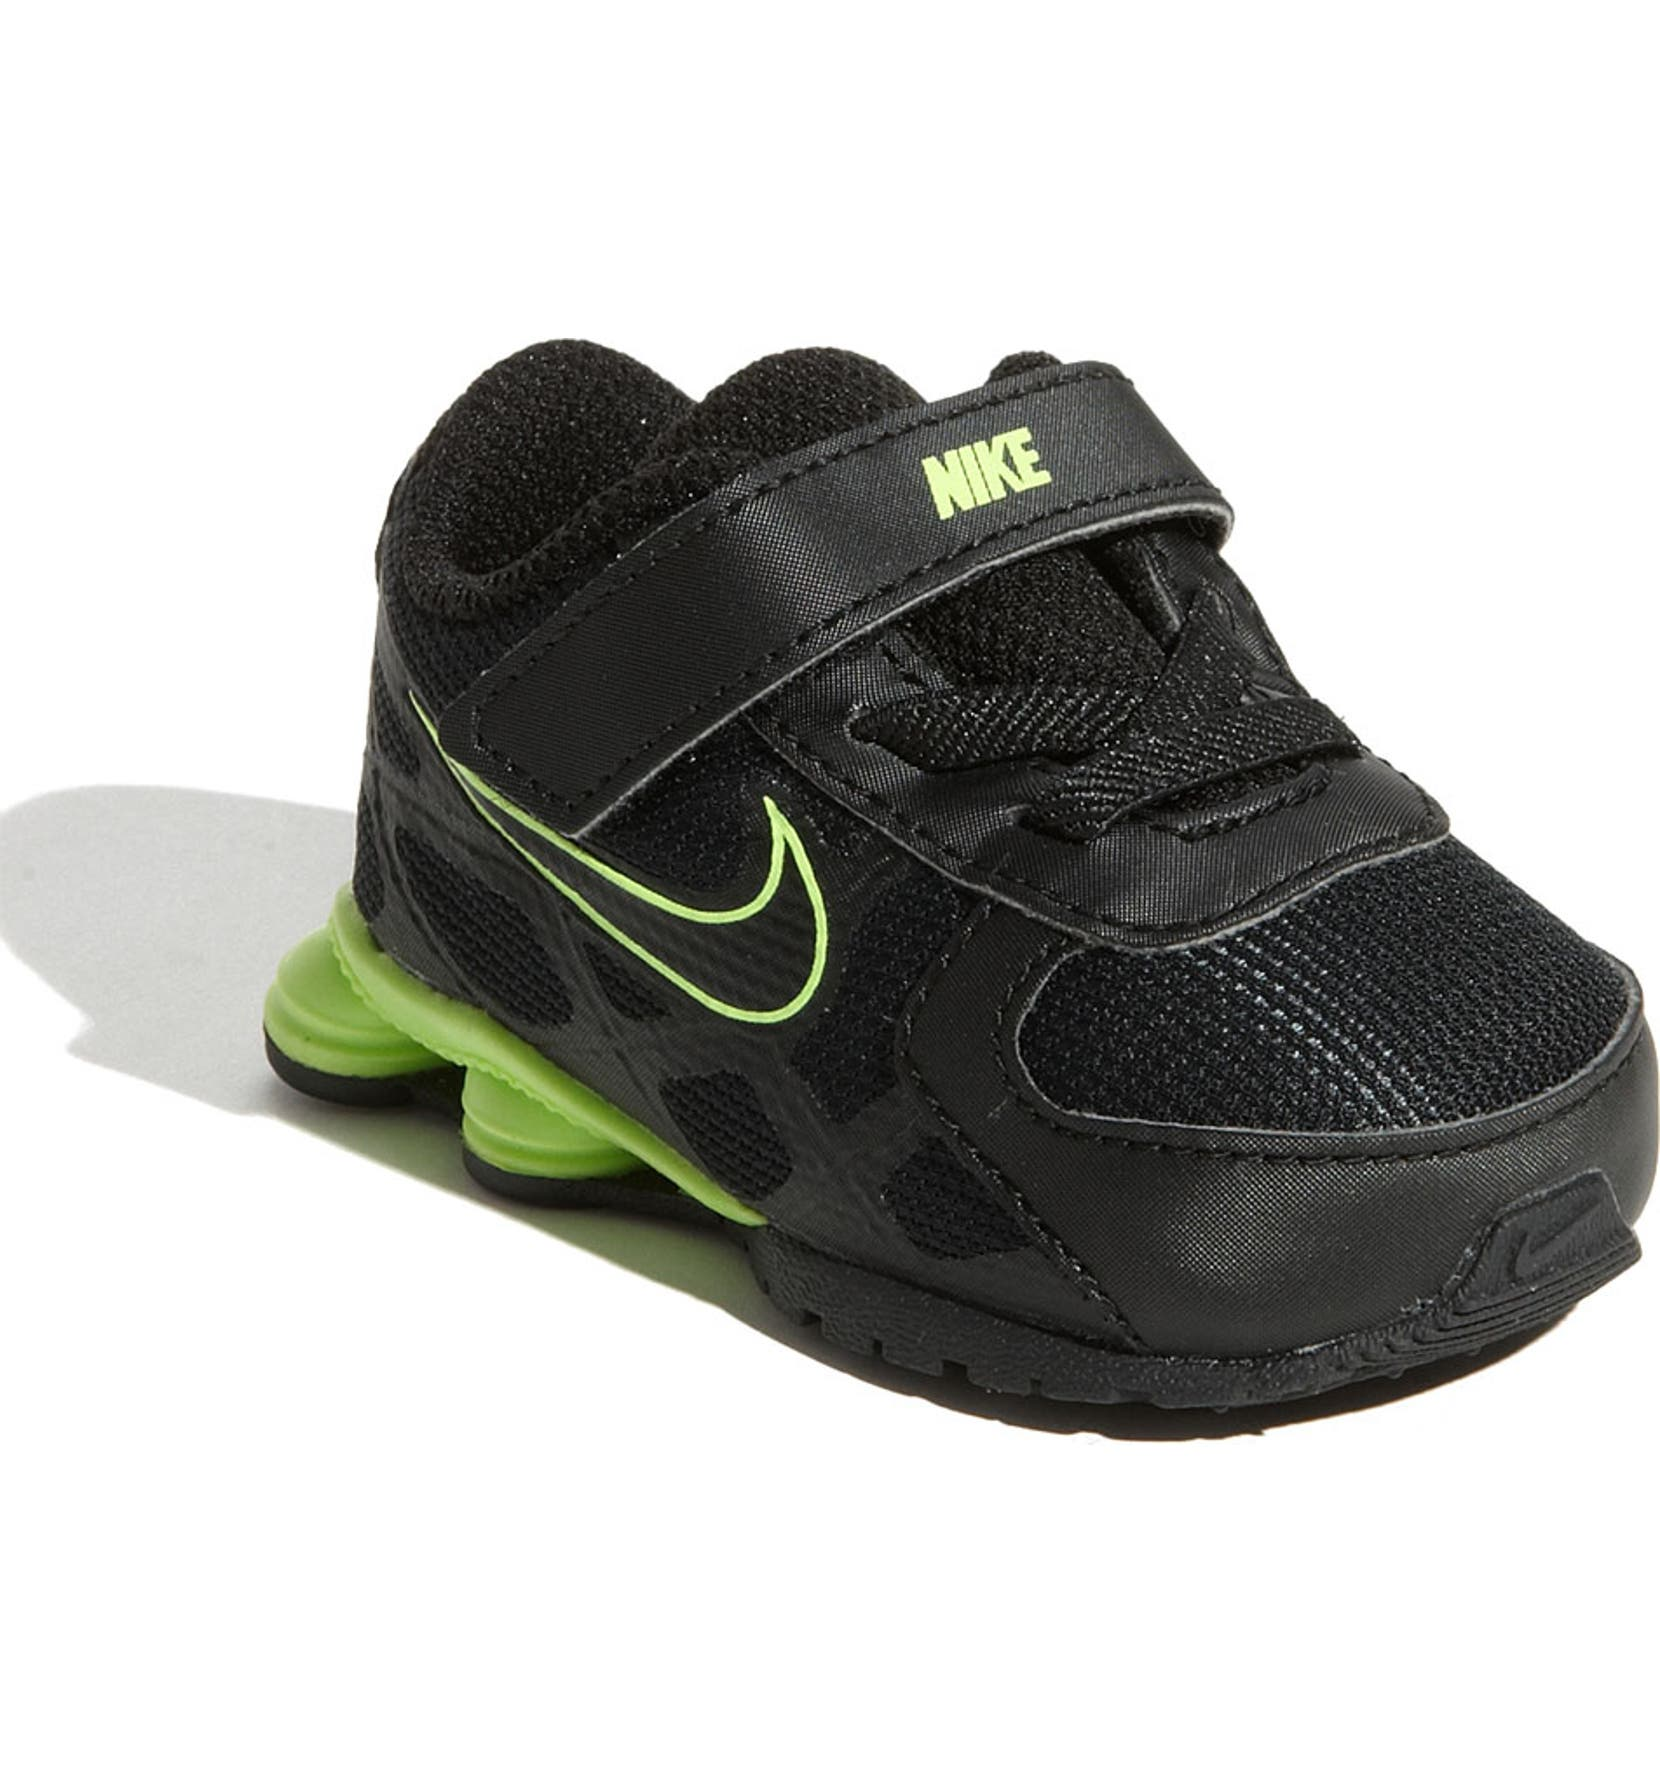 6b10b3952ab097 Nike  Shox Turbo 12  Running Shoe (Baby